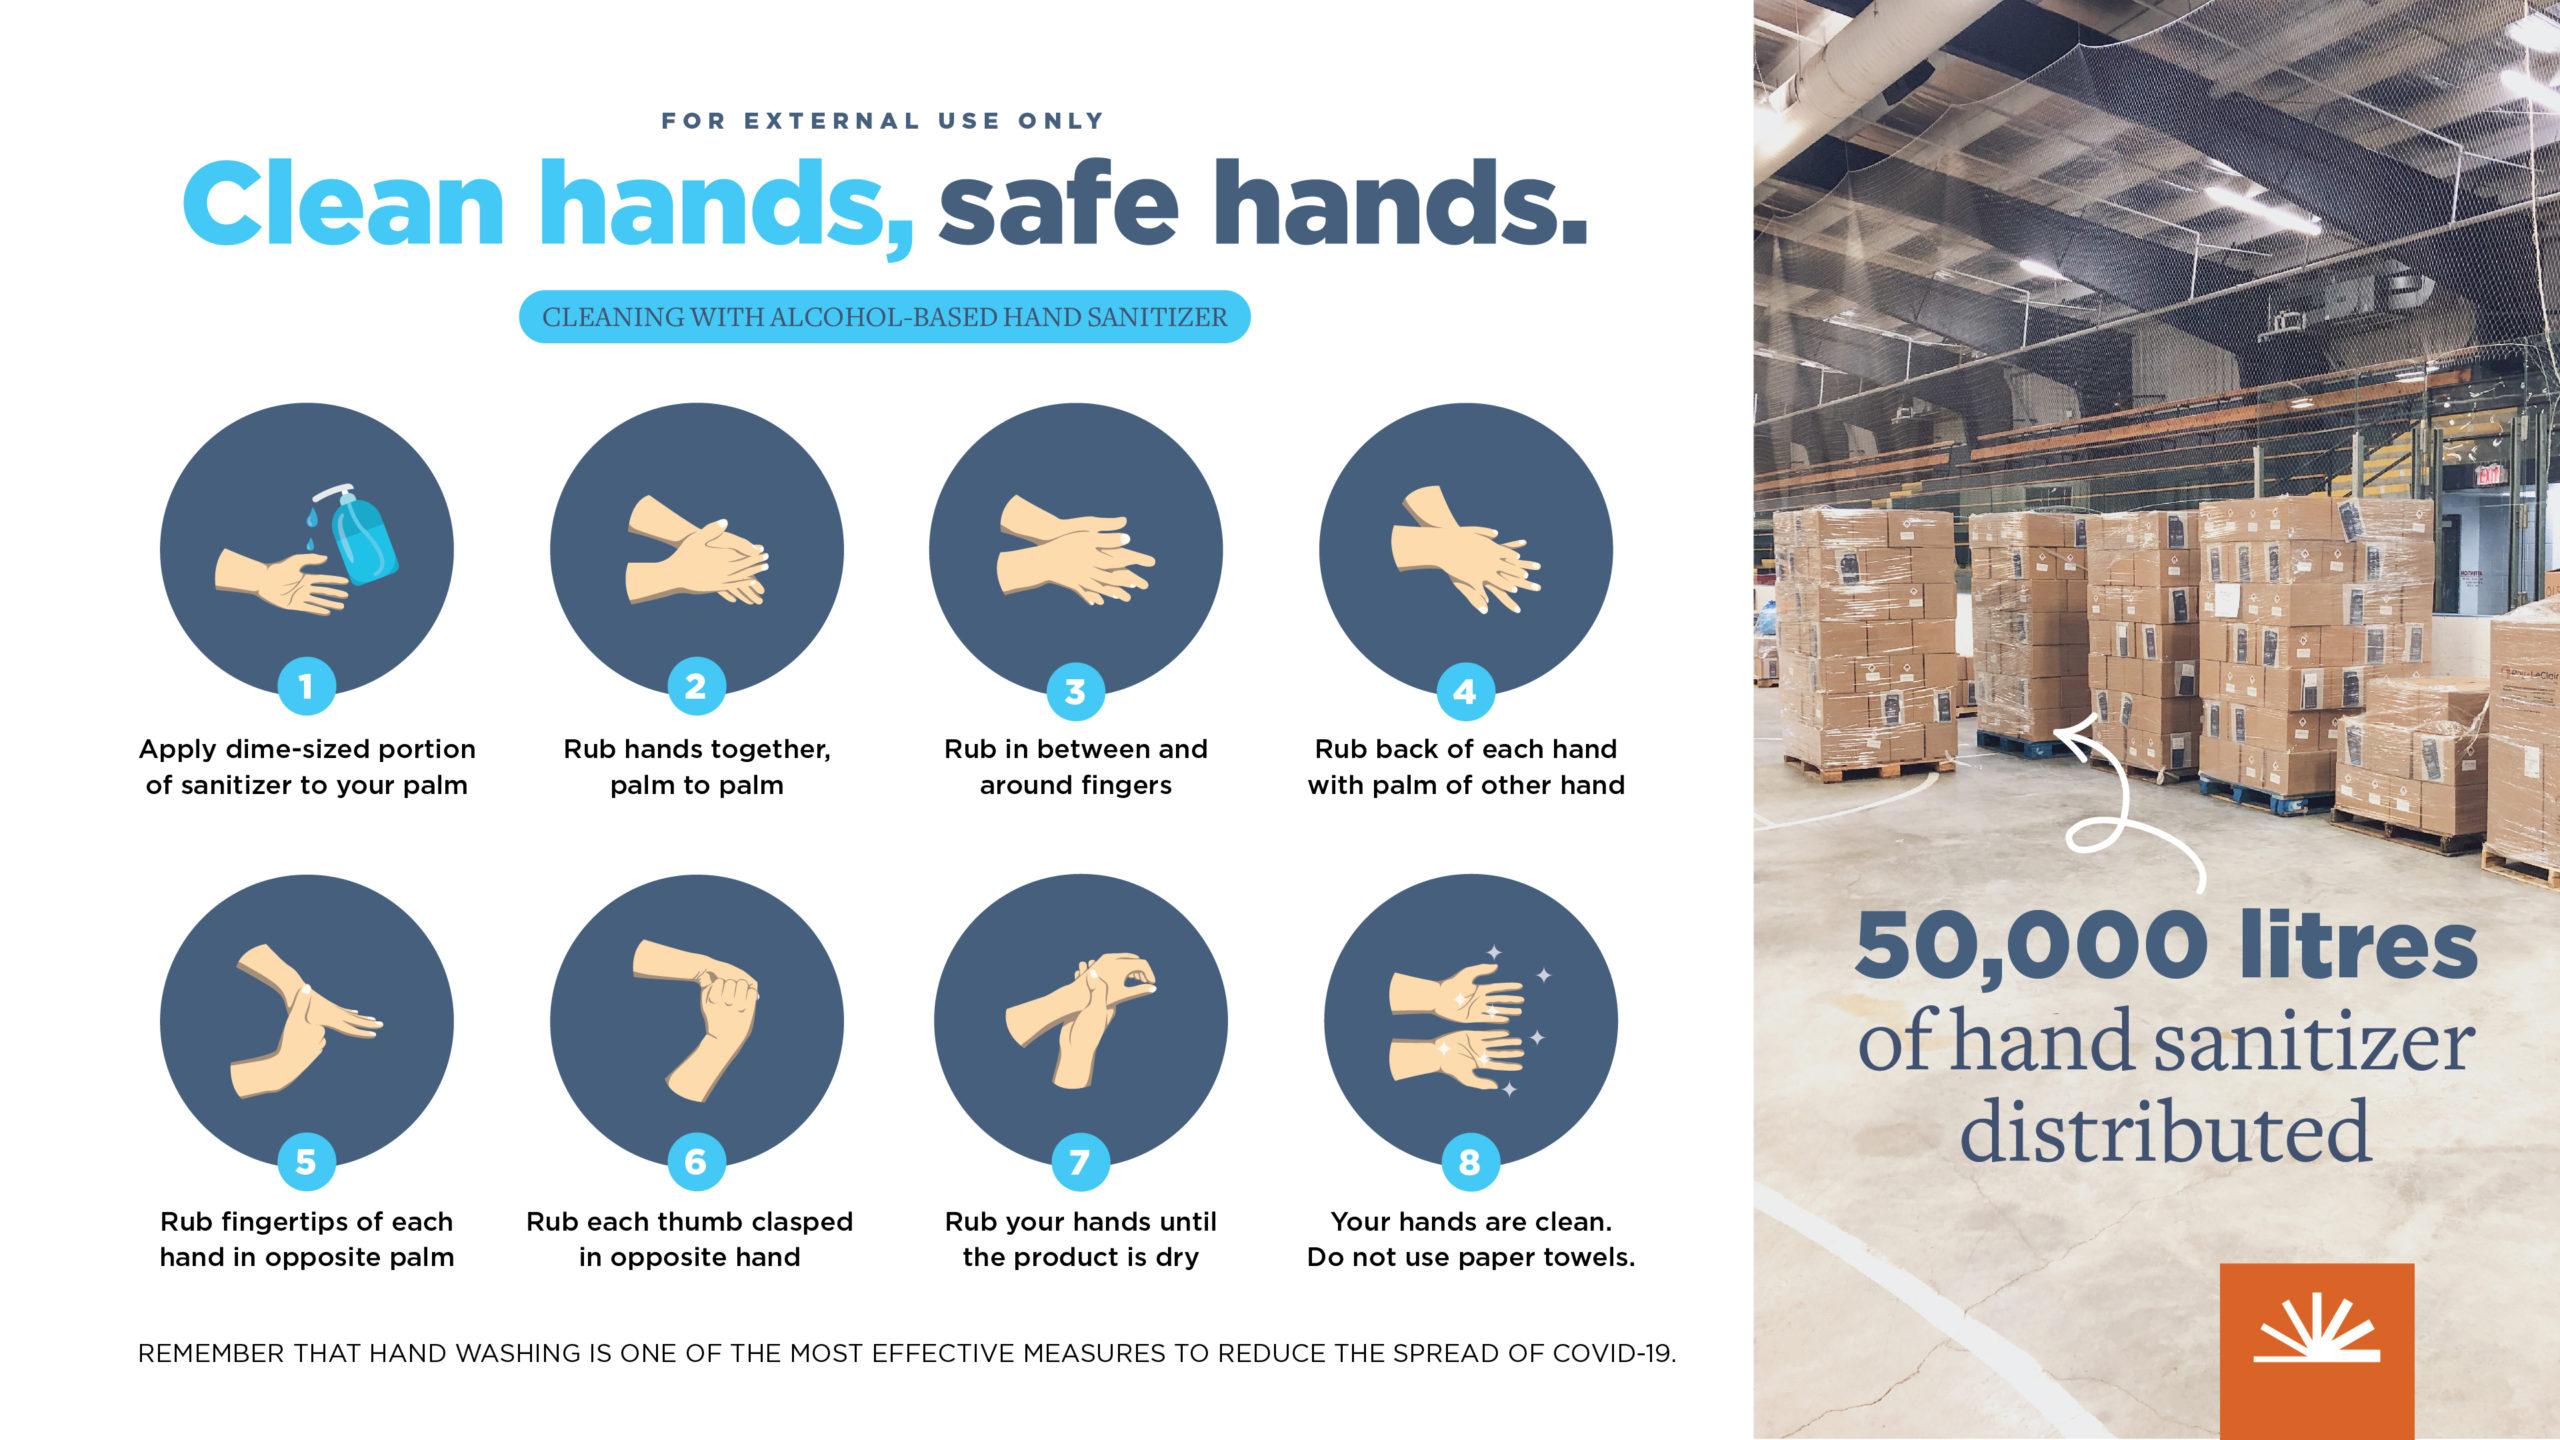 Bruce Power hand sanitizer instructions